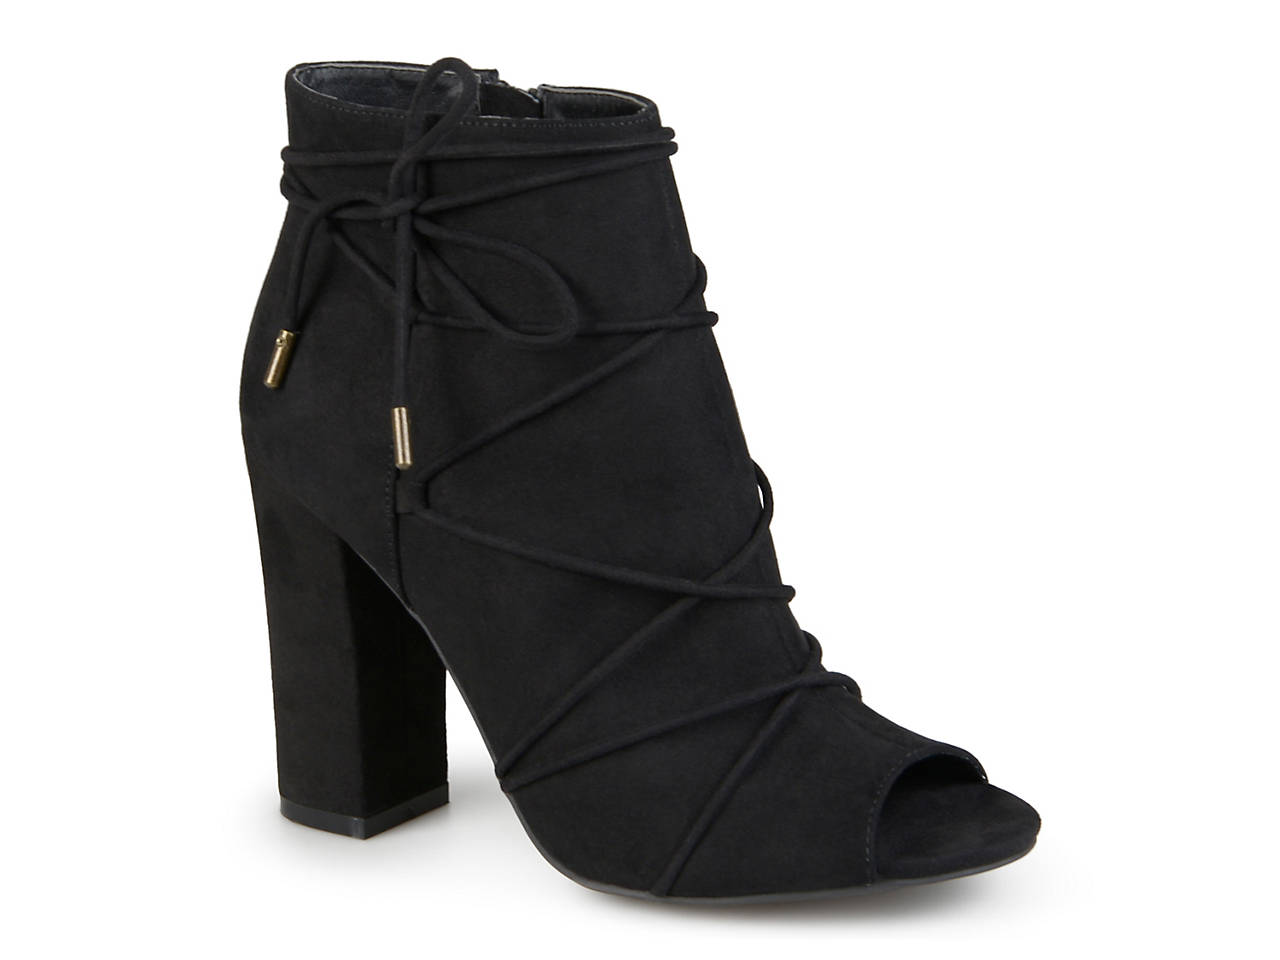 Journee Collection Maci ... Women's Ankle Boots AlMn9nl